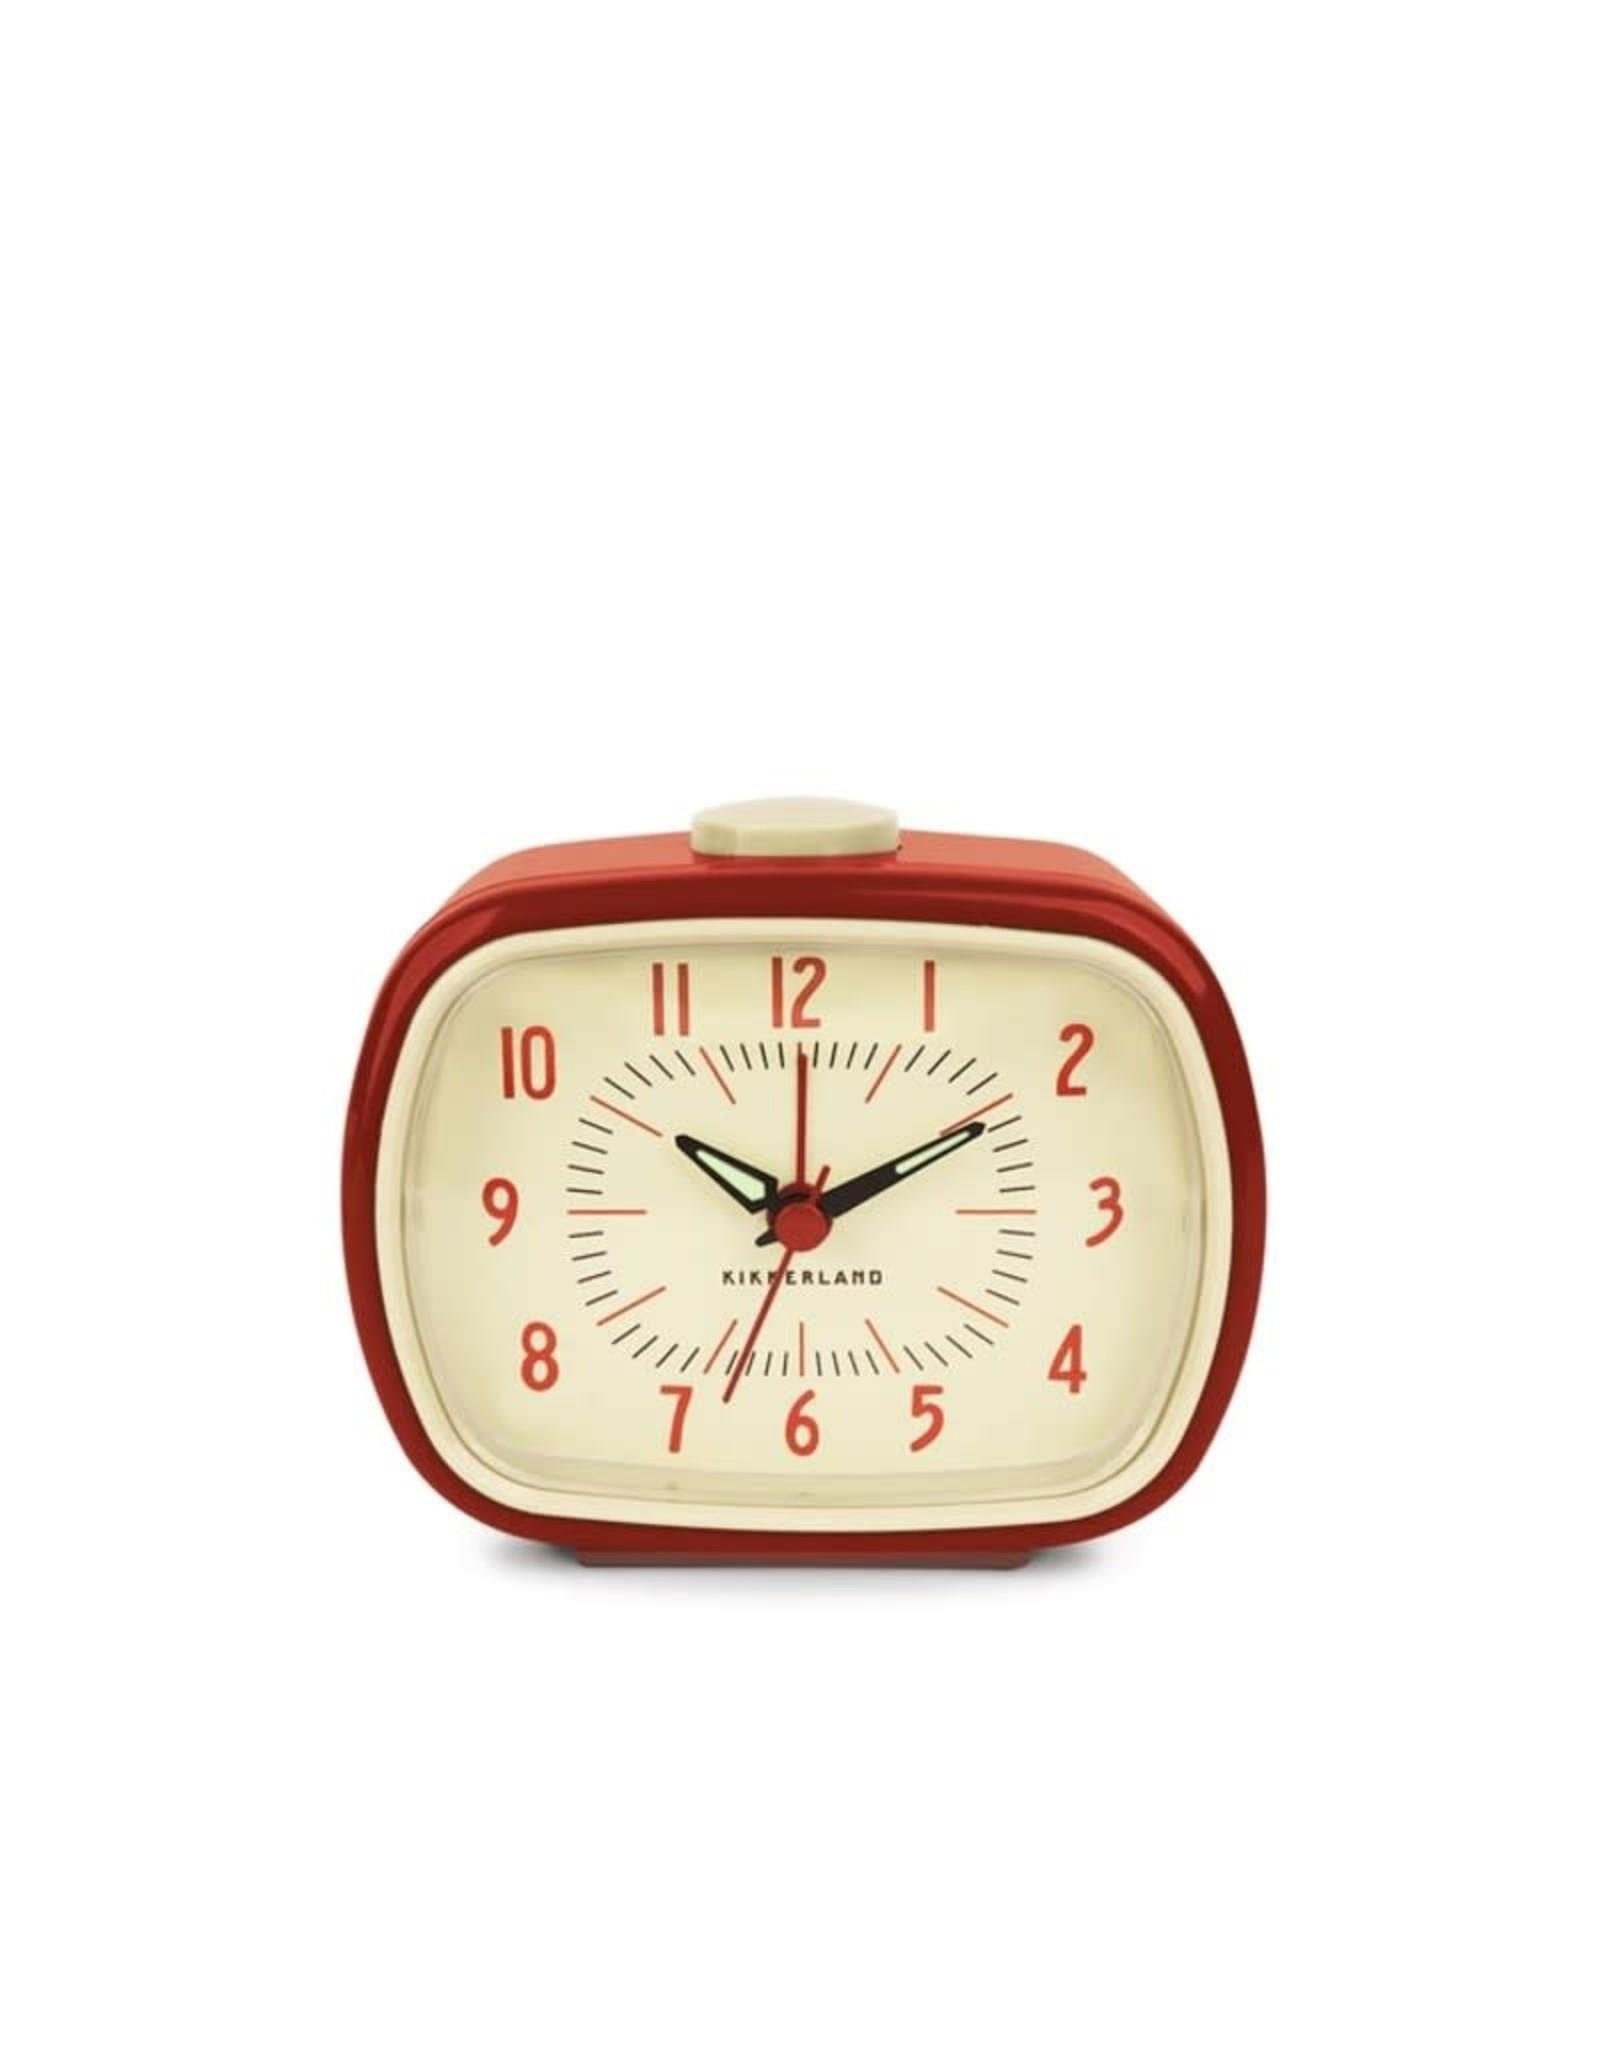 Kikkerland Retro Alarm Clock Red